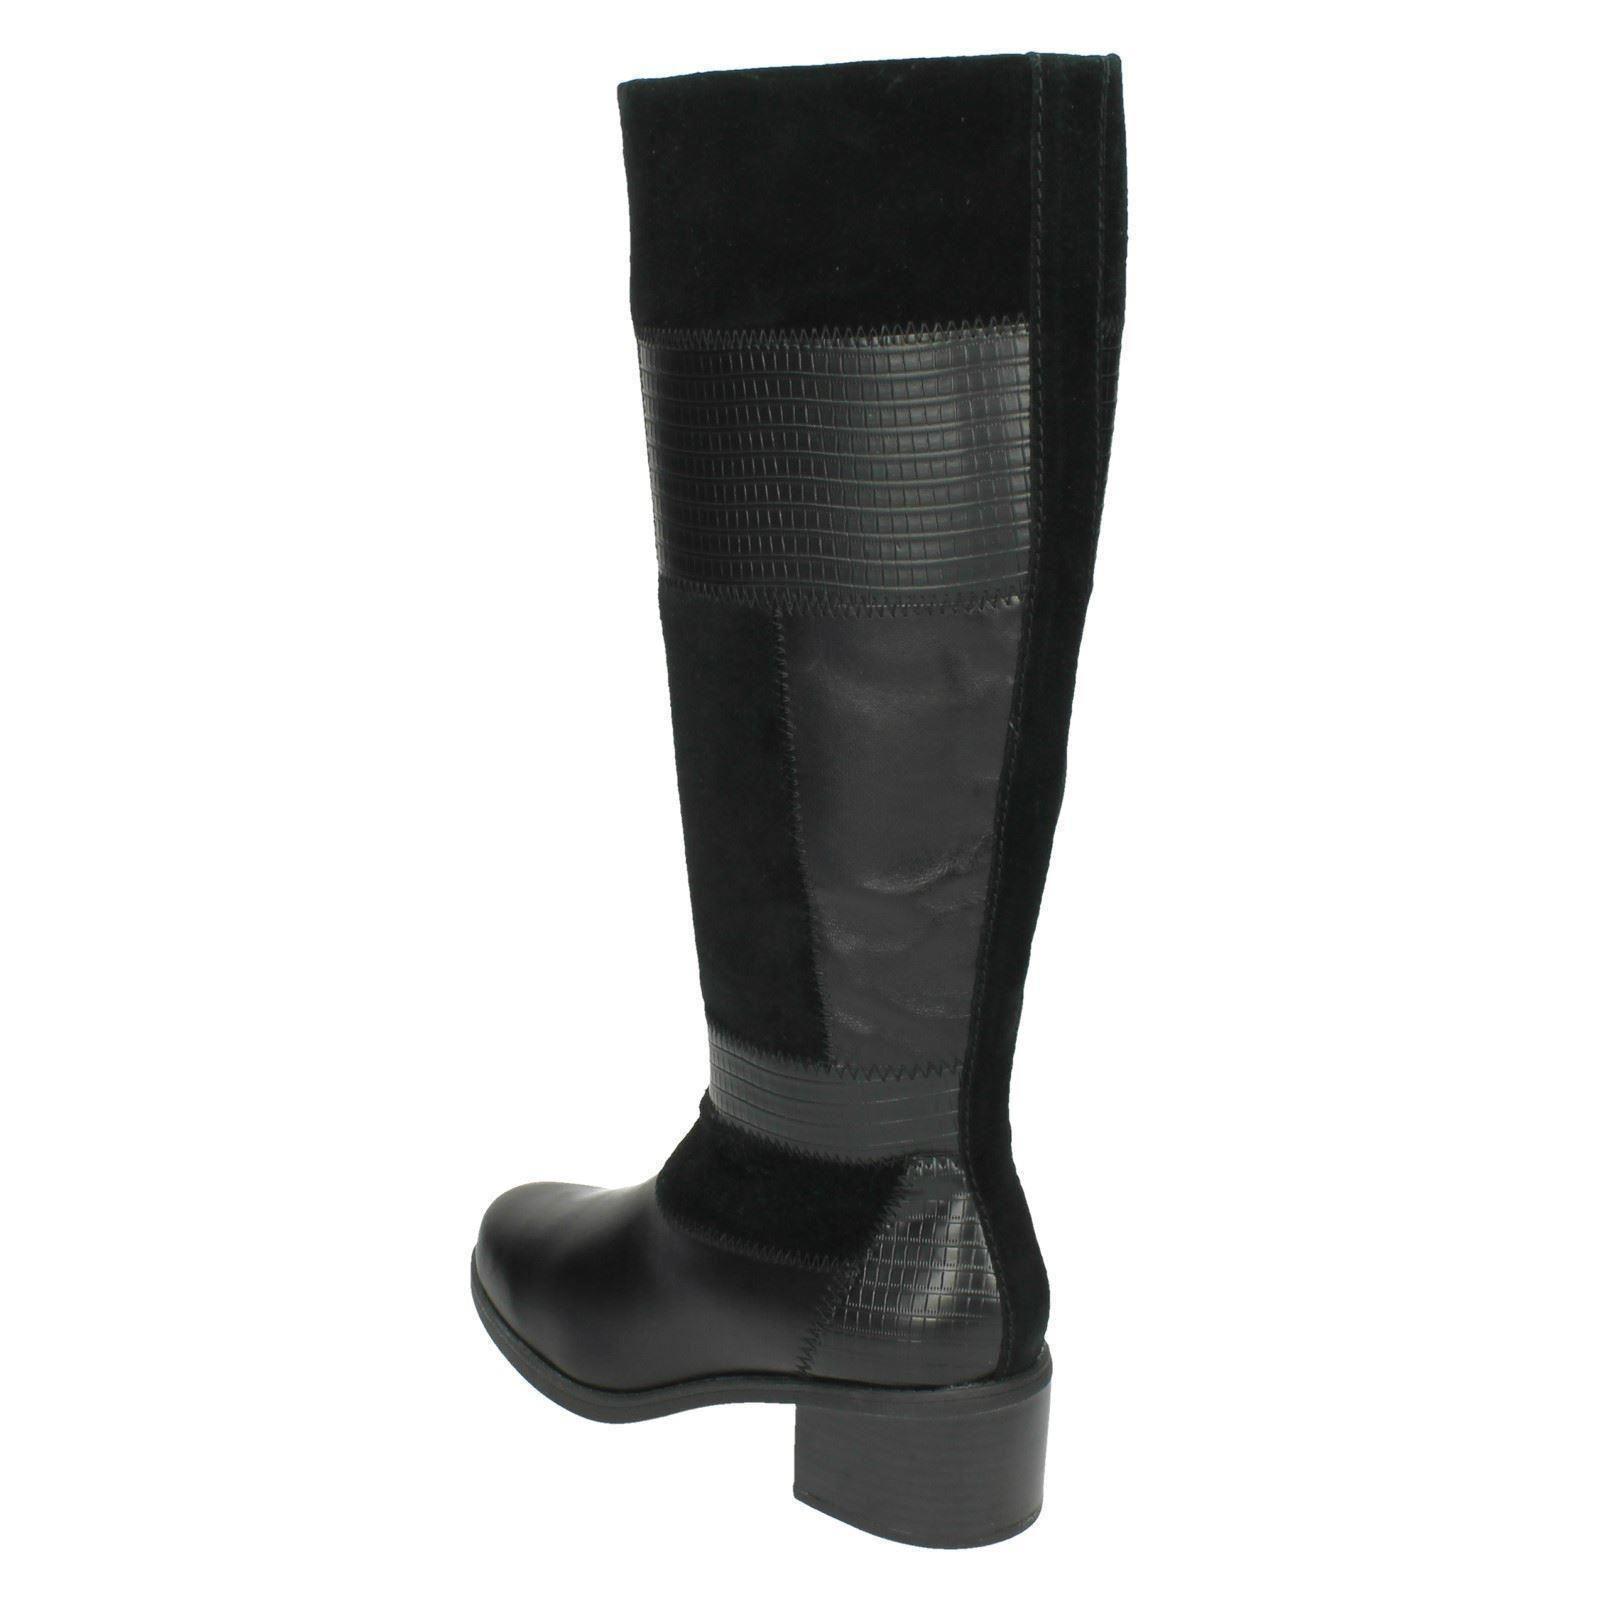 Nova botas Nevella largas Señoras Clarks negro xfq6H68w